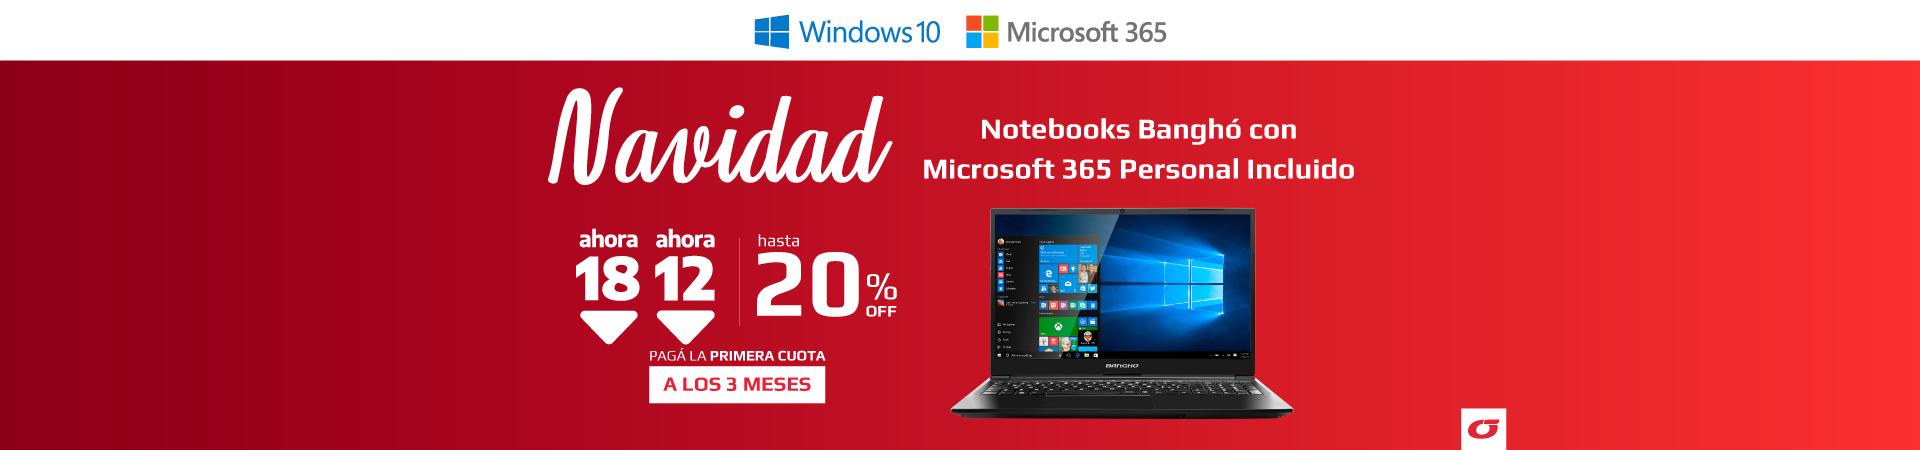 navidad - desktop